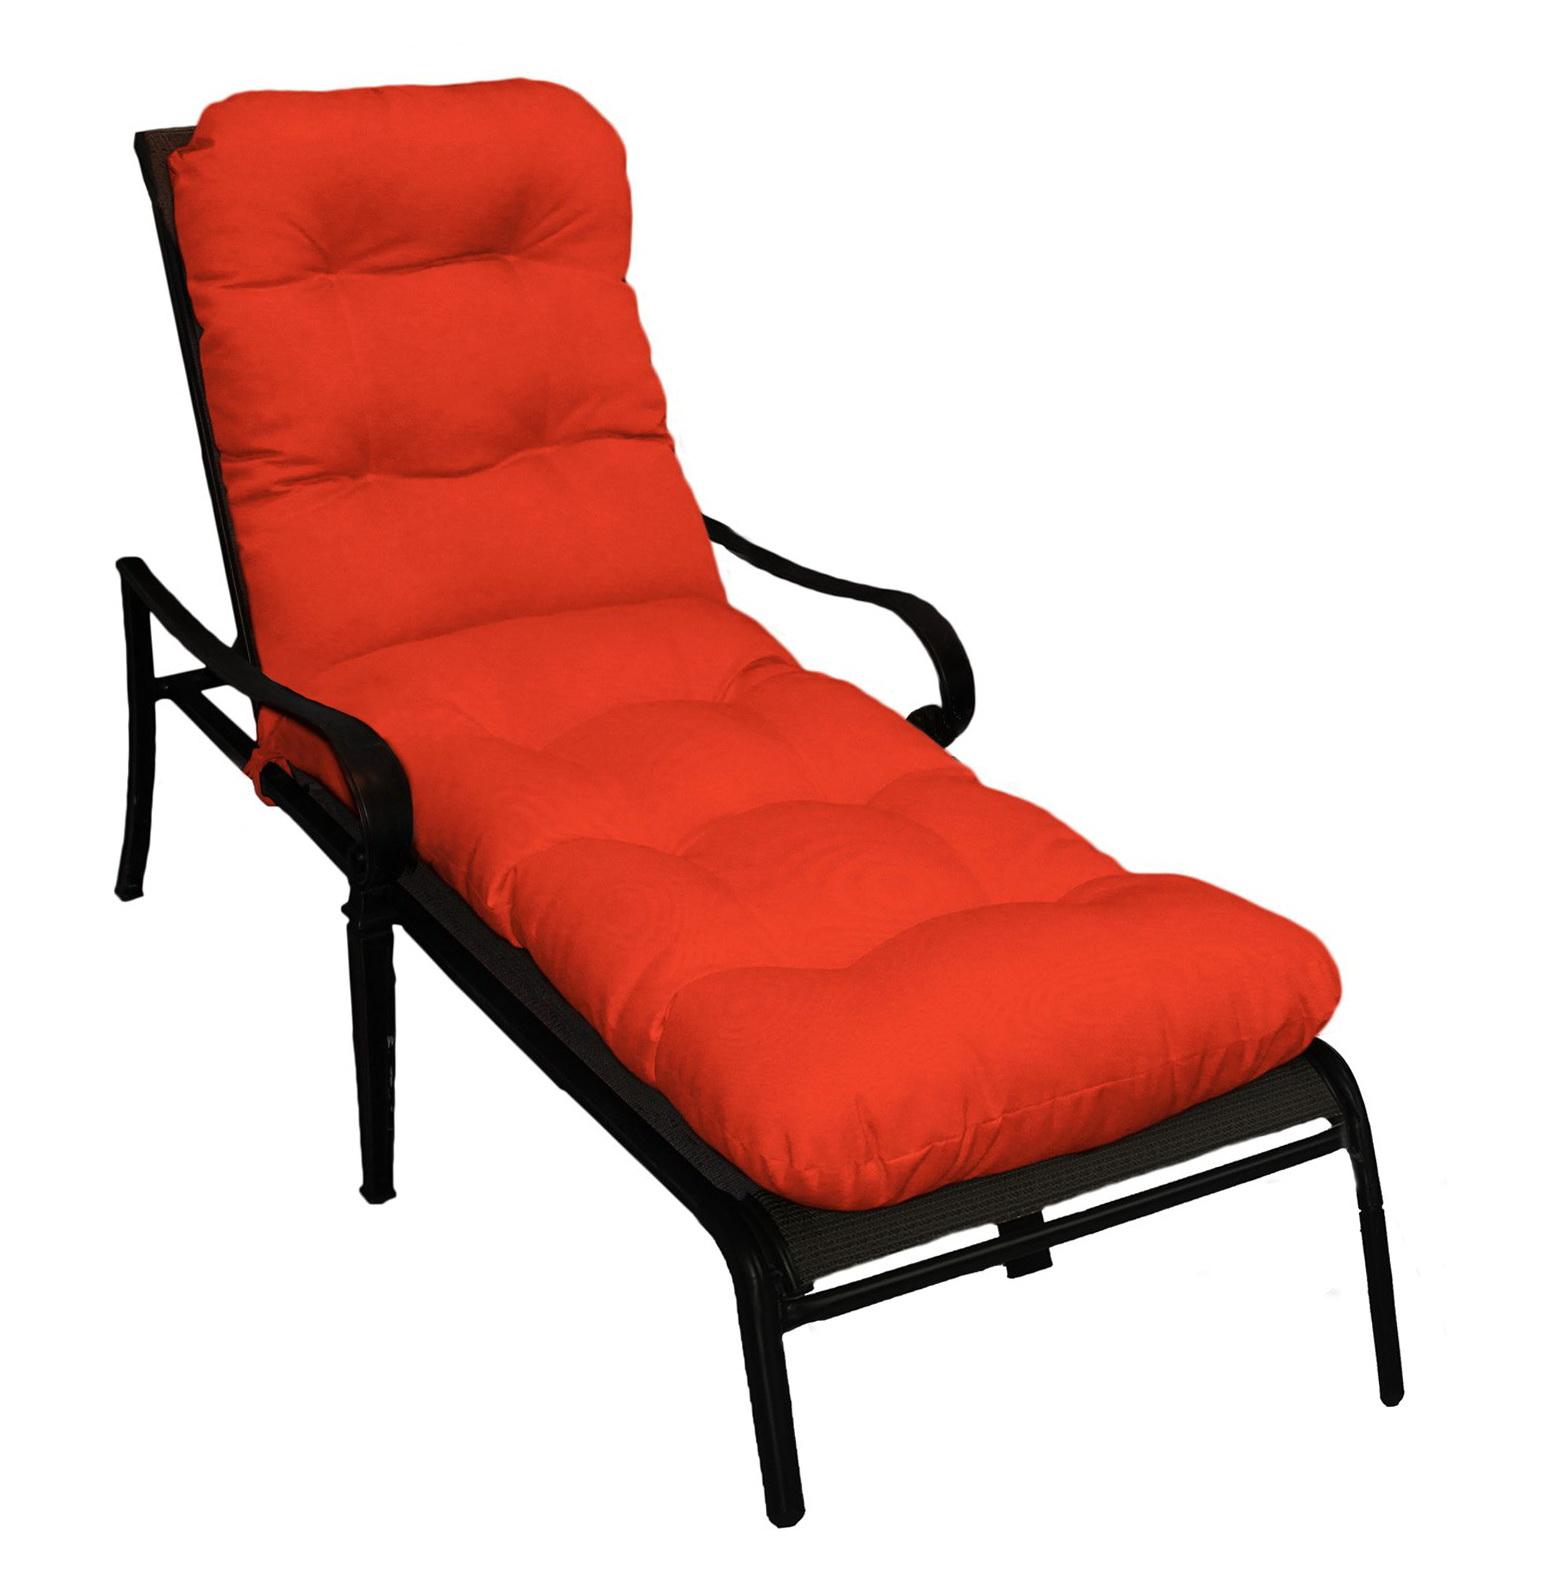 Lounge Chair Cushions Target